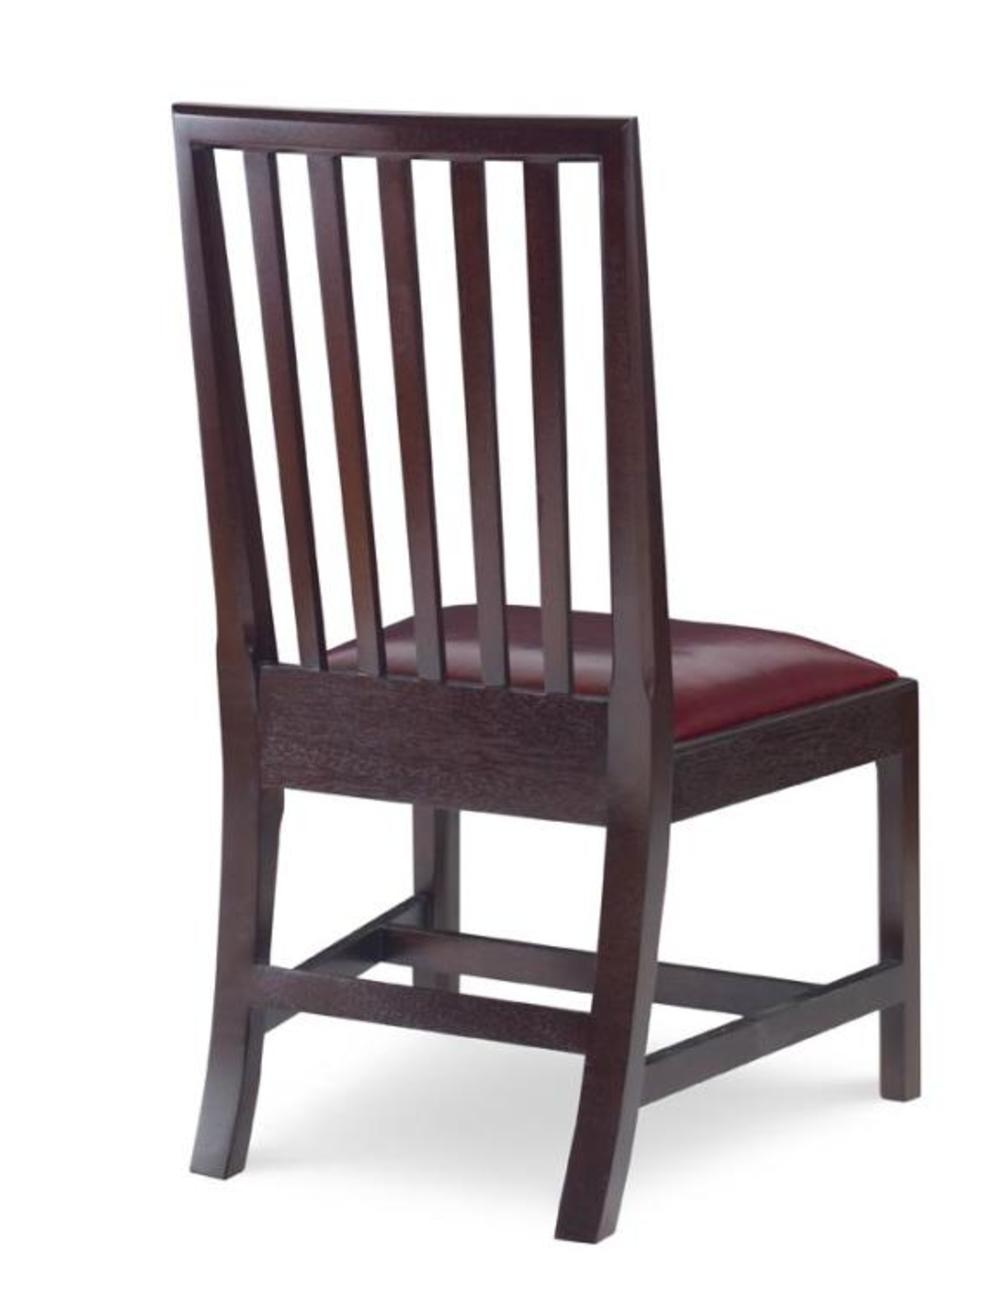 Century Furniture - Emmett Slat Back Side Chair